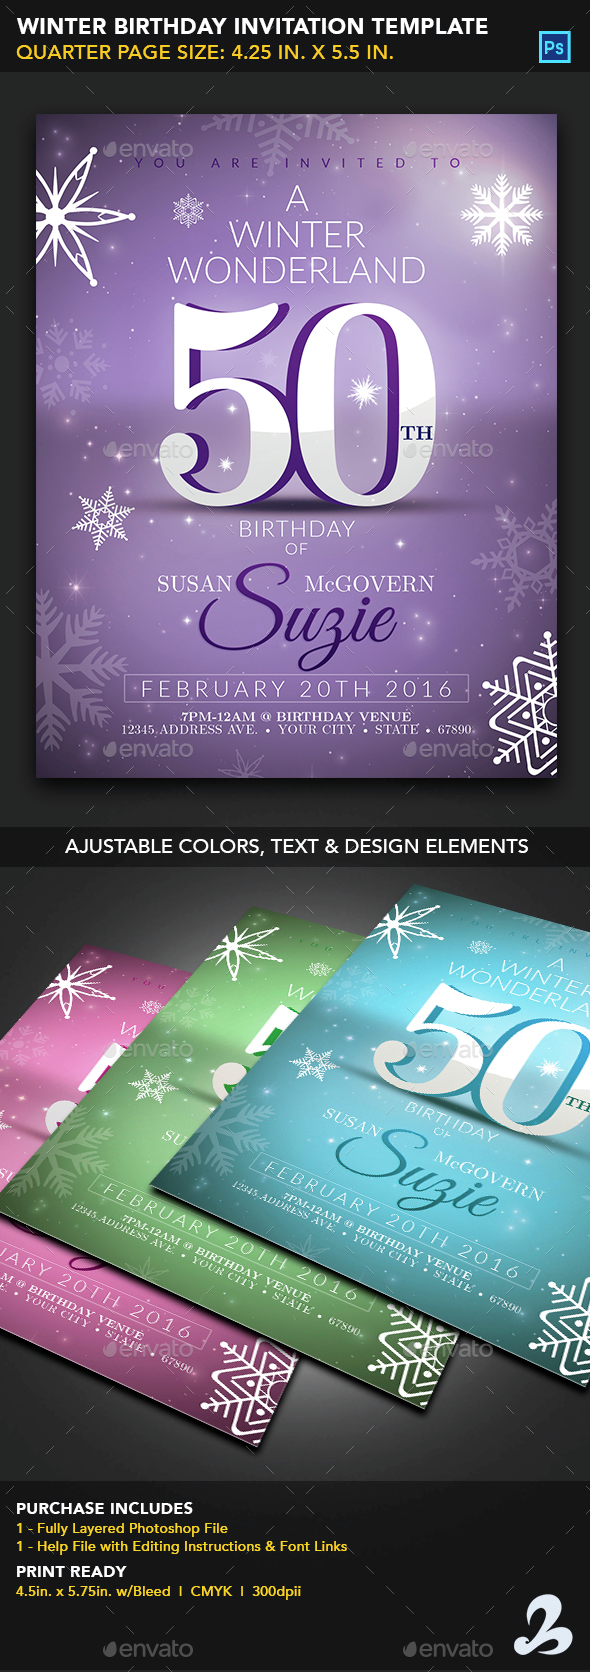 Winter Birthday Invitation Template  - Invitations Cards & Invites